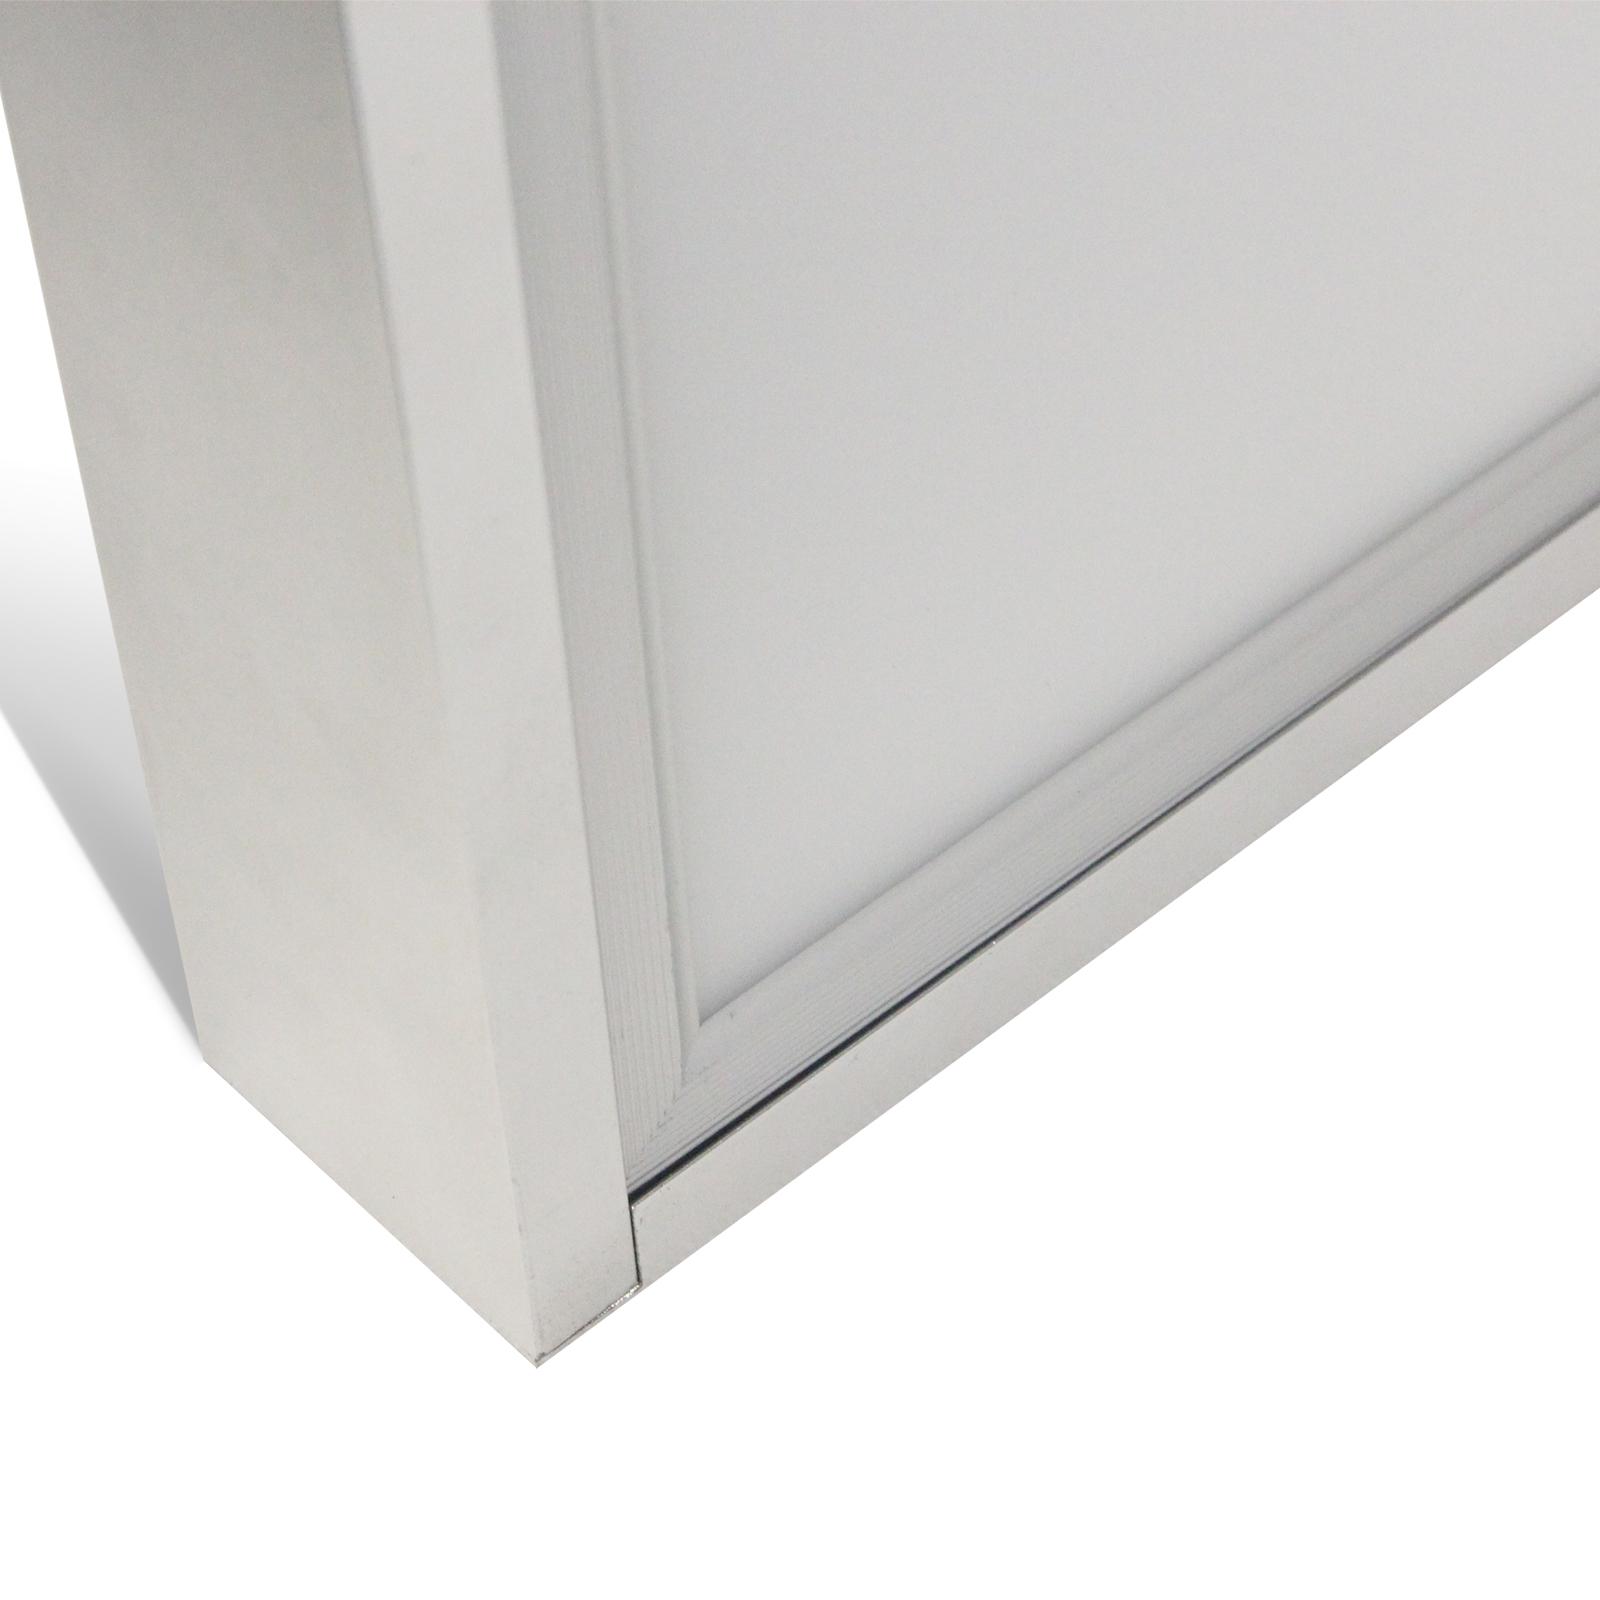 led panel rahmen anbaurahmen aufputz f r decke wand halterung geh use 62x62cm ebay. Black Bedroom Furniture Sets. Home Design Ideas